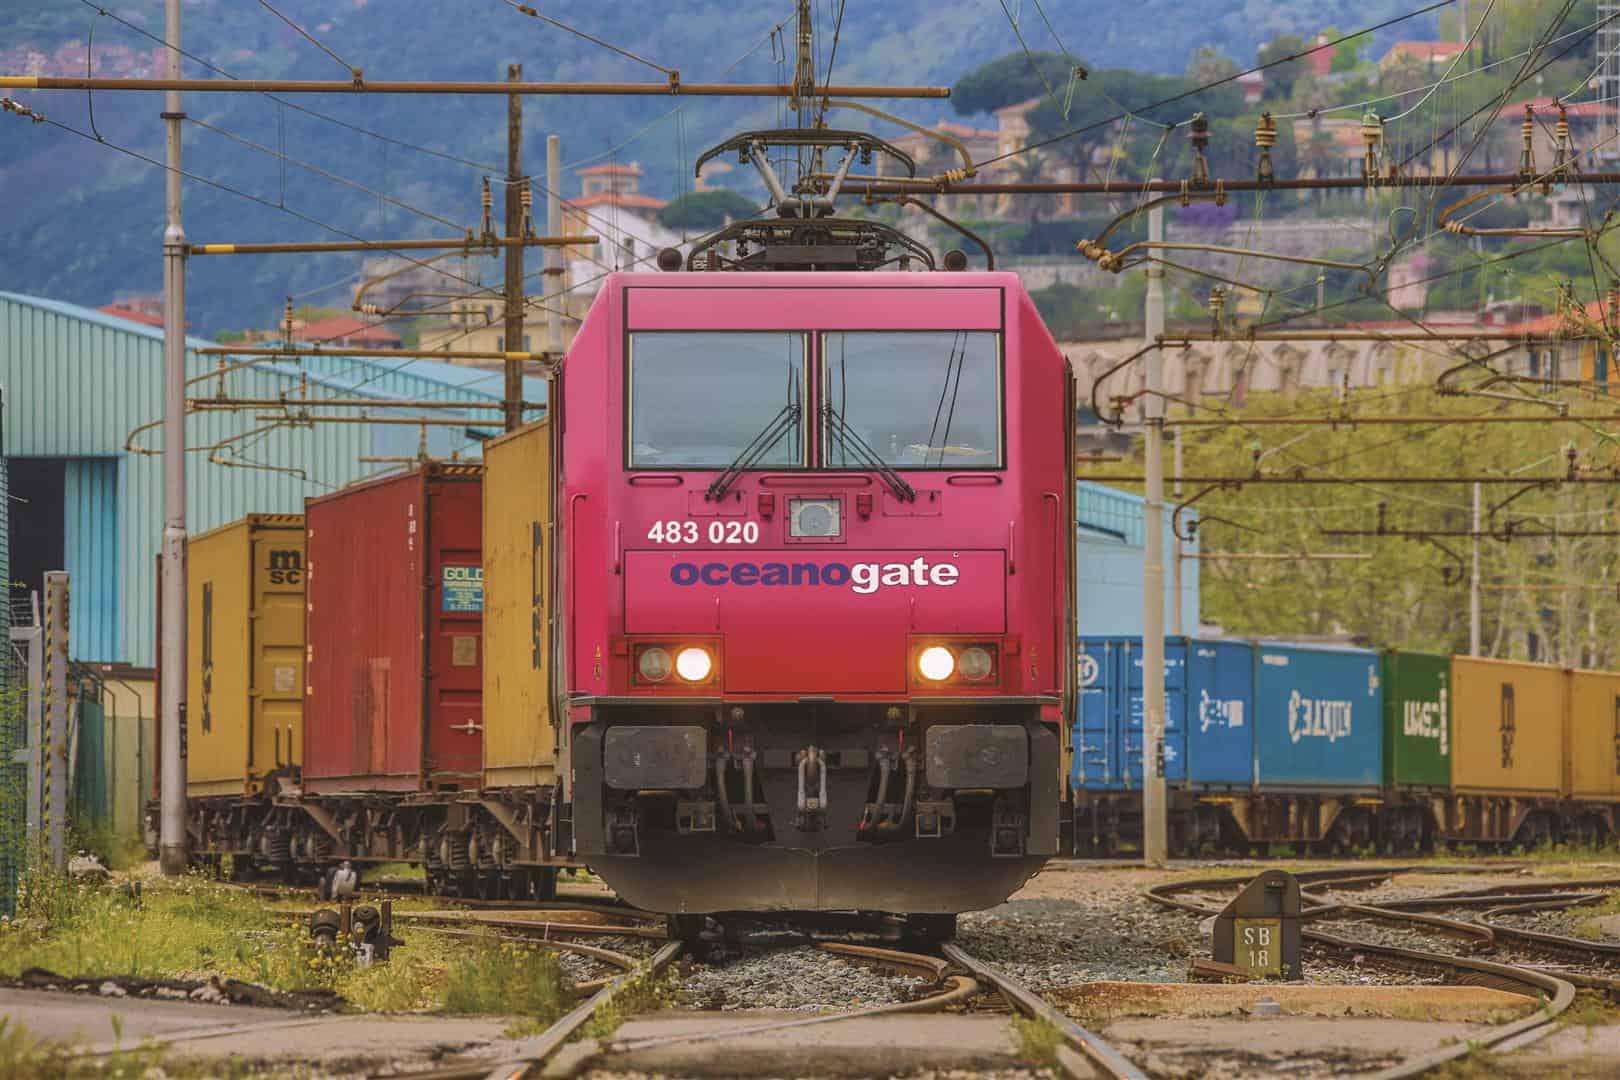 Hannibal and IMS link Italian ports to Switzerland